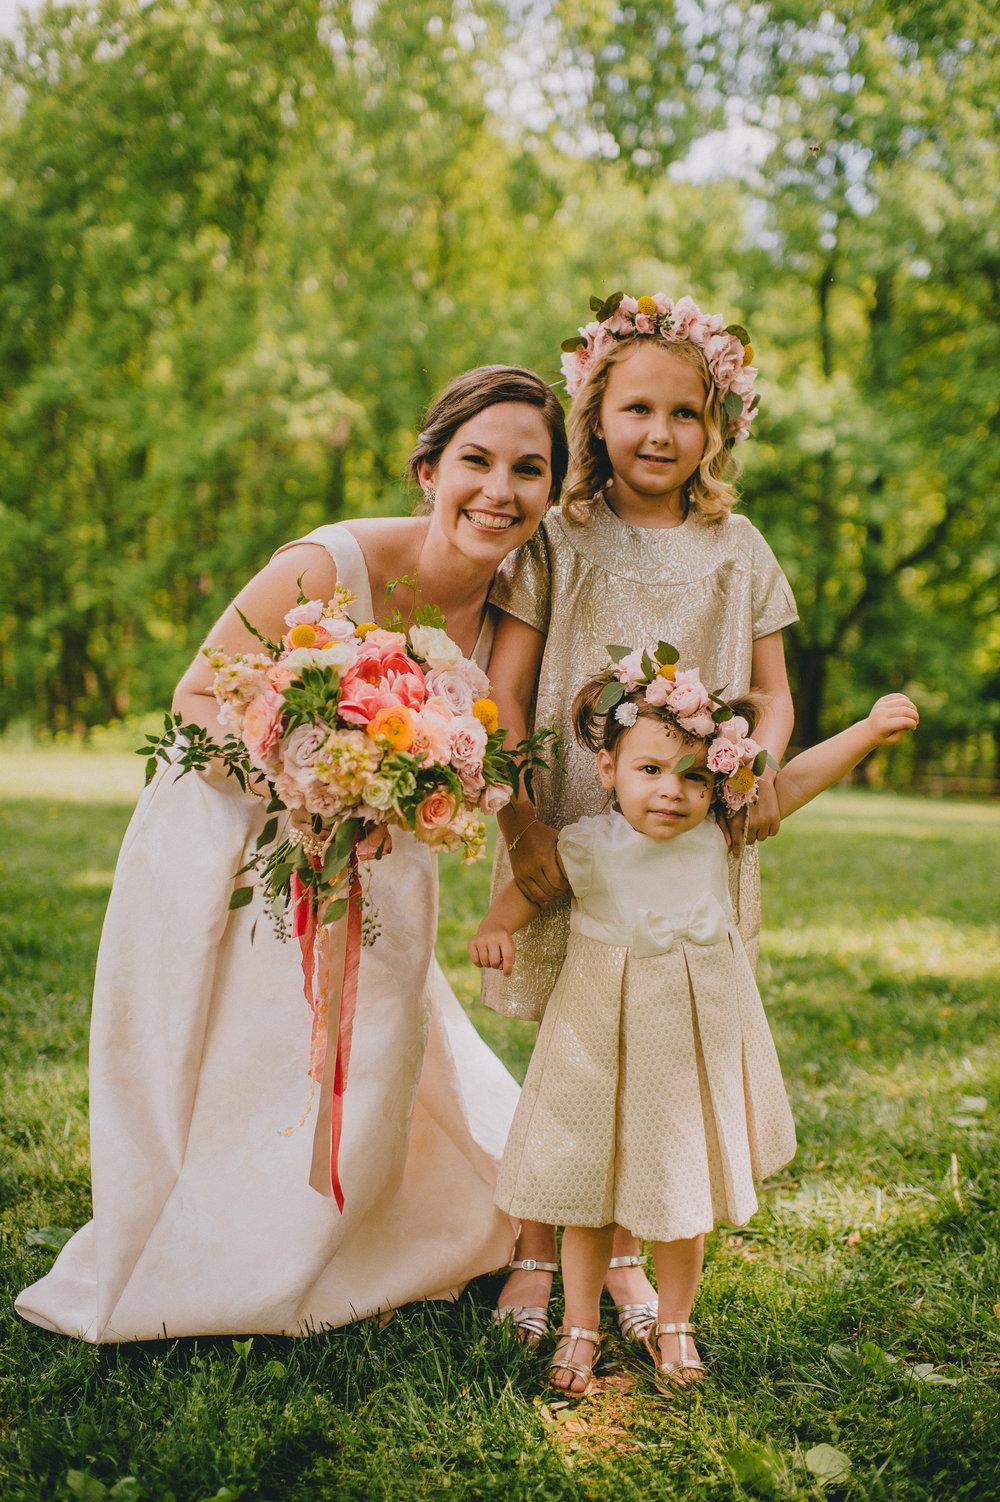 brielle-davis-events-bride-with-flower-girls-woodend-sanctuary.jpg